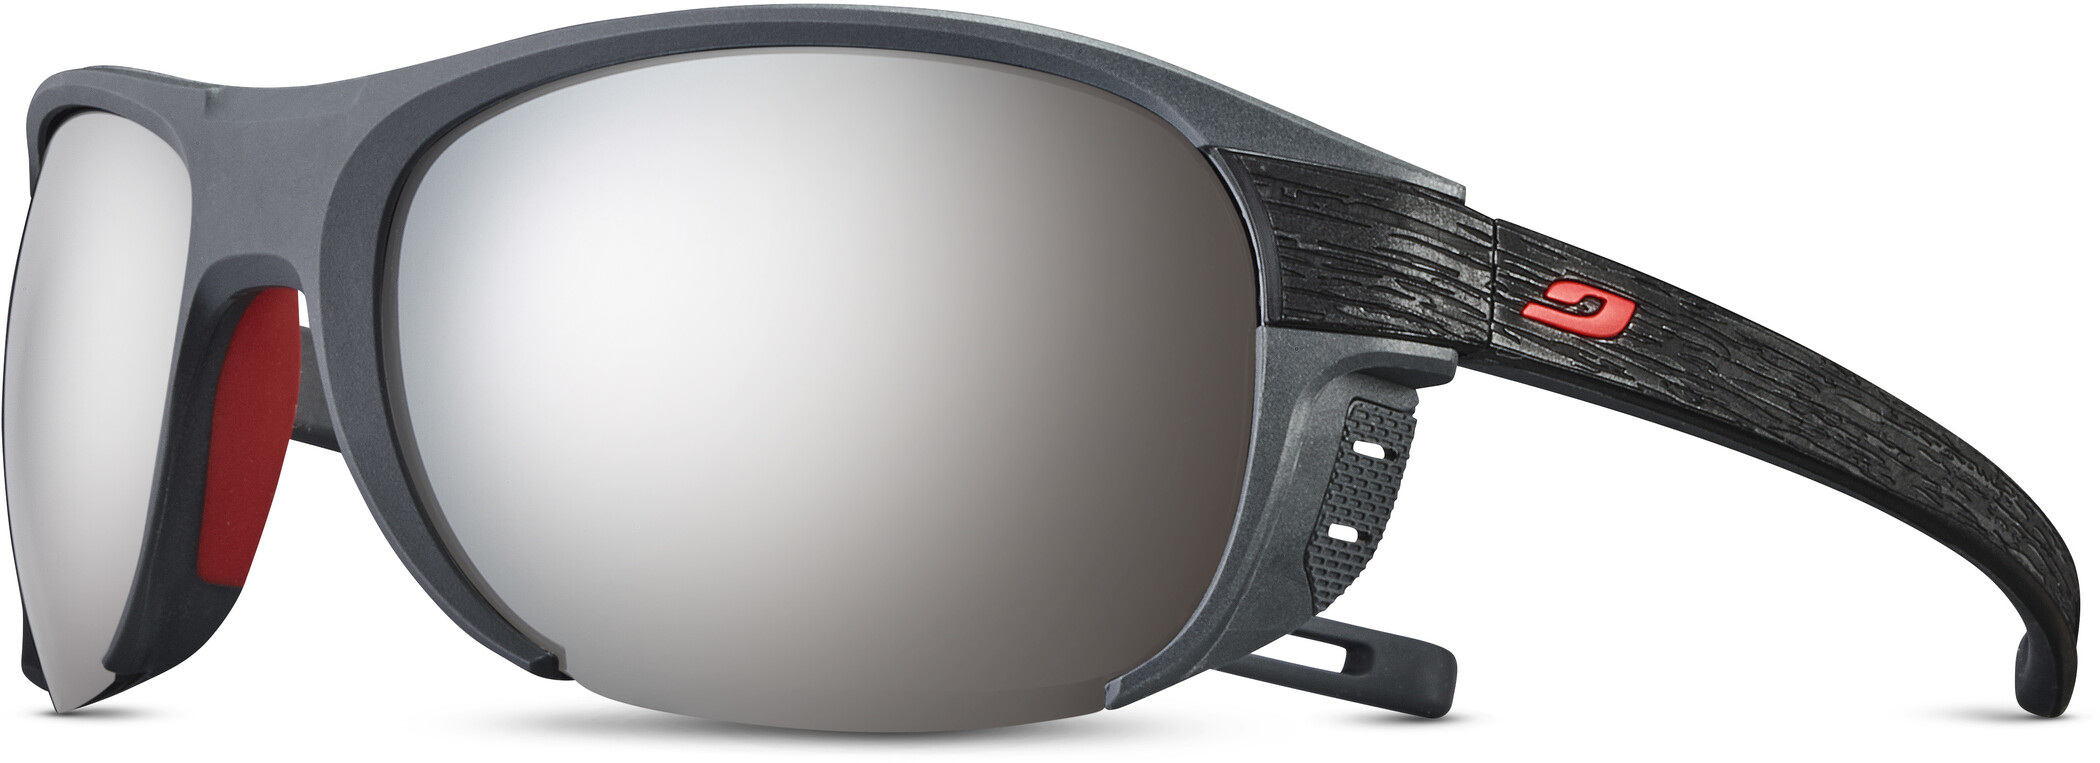 Julbo Regatta Spectron 4 Solbriller, black/red/brown (2020) | Glasses